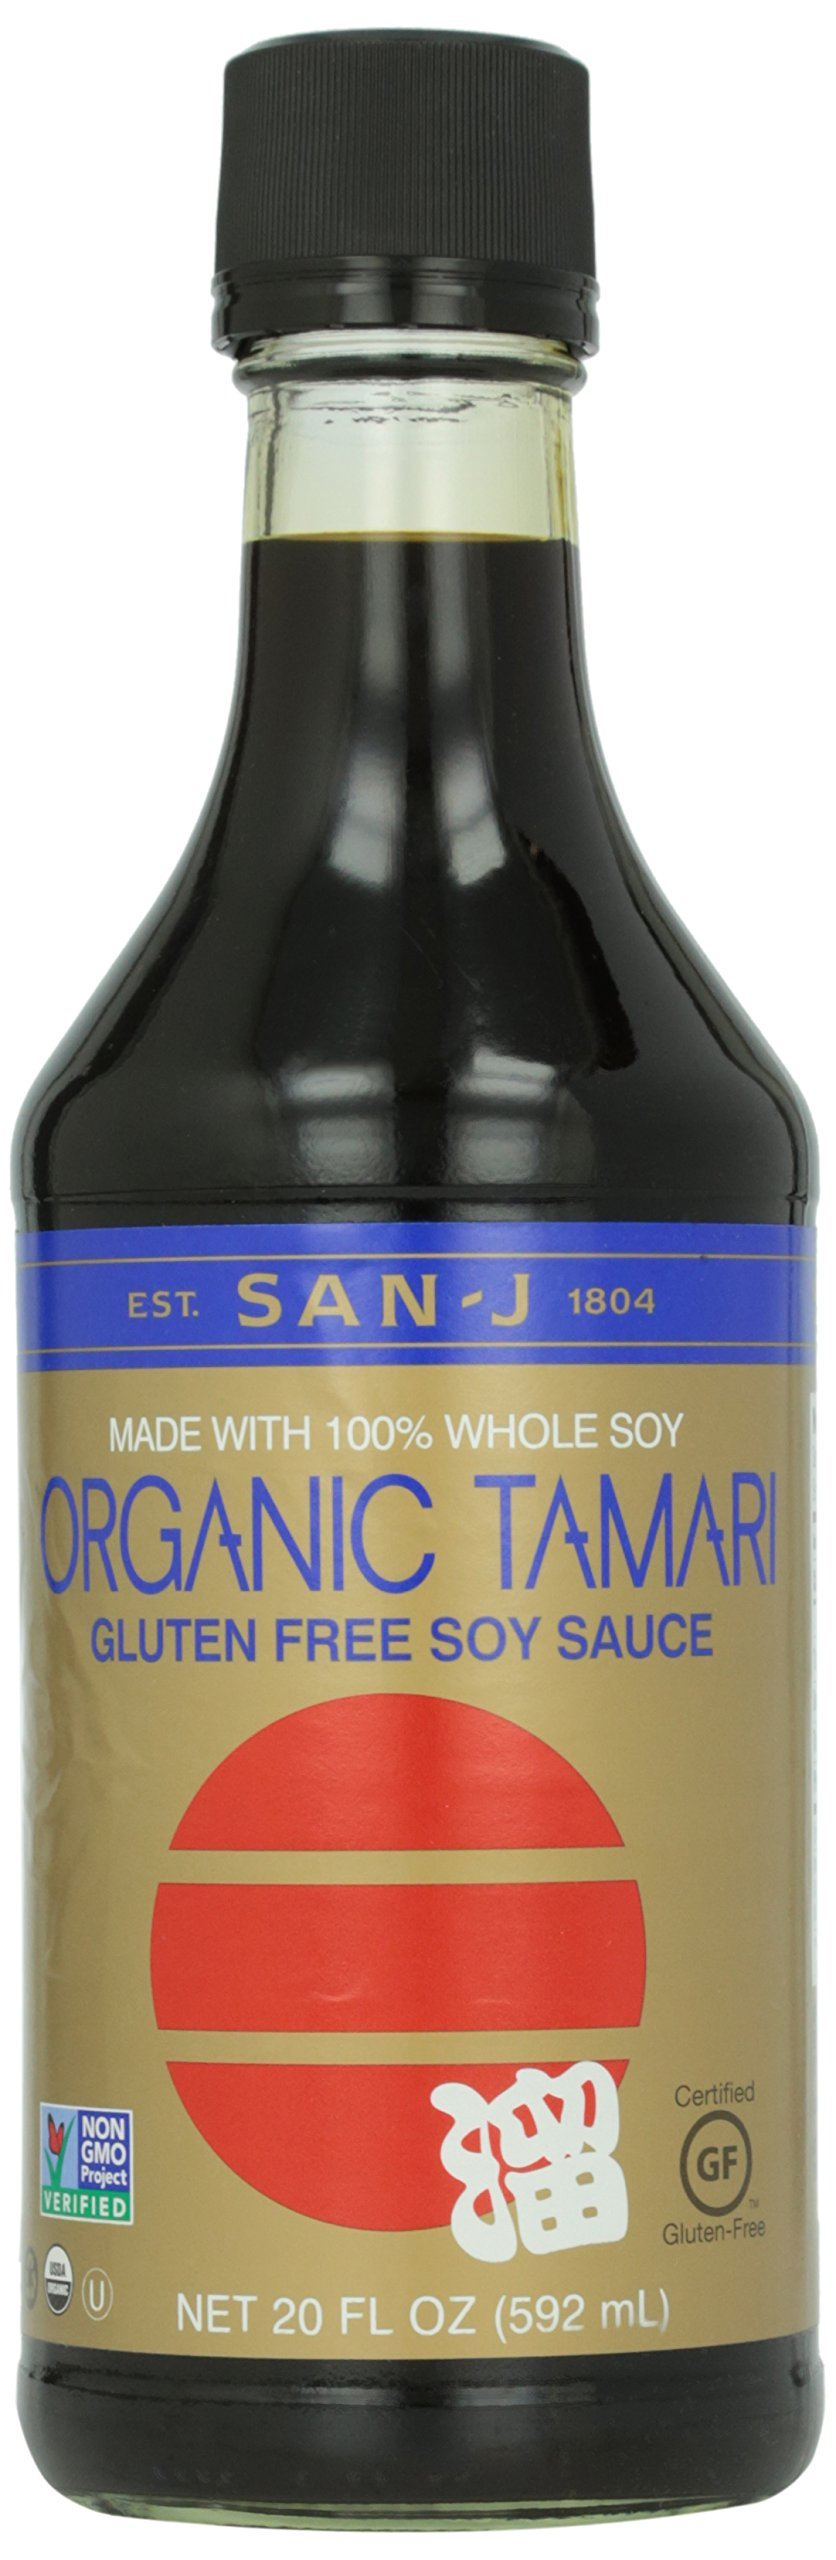 San-j Organic Tamari, 20 oz by San-J